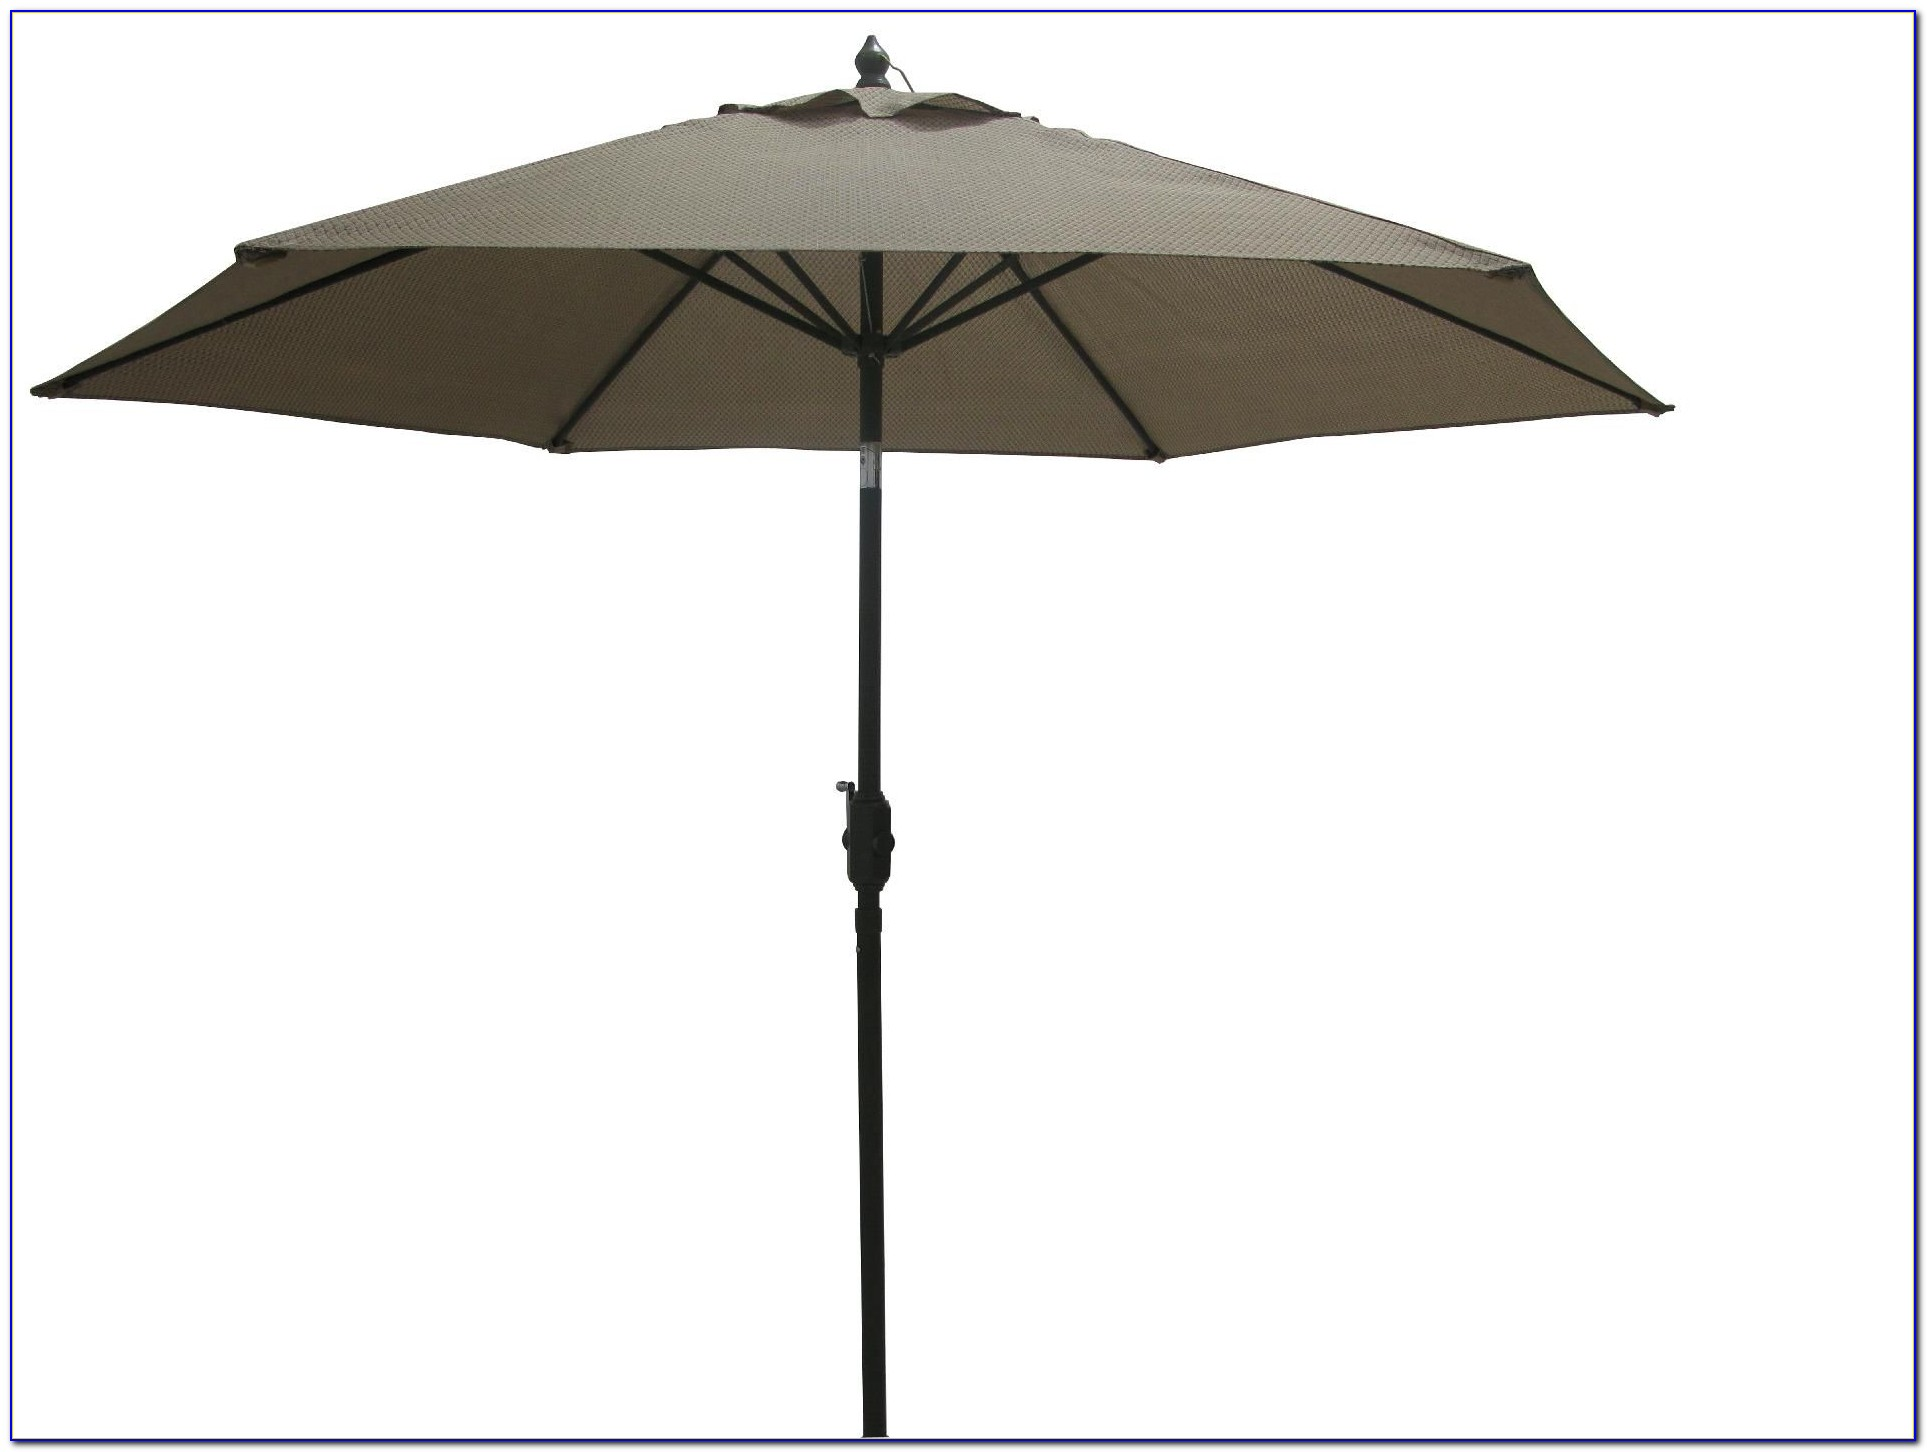 Sears Patio Umbrella Covers